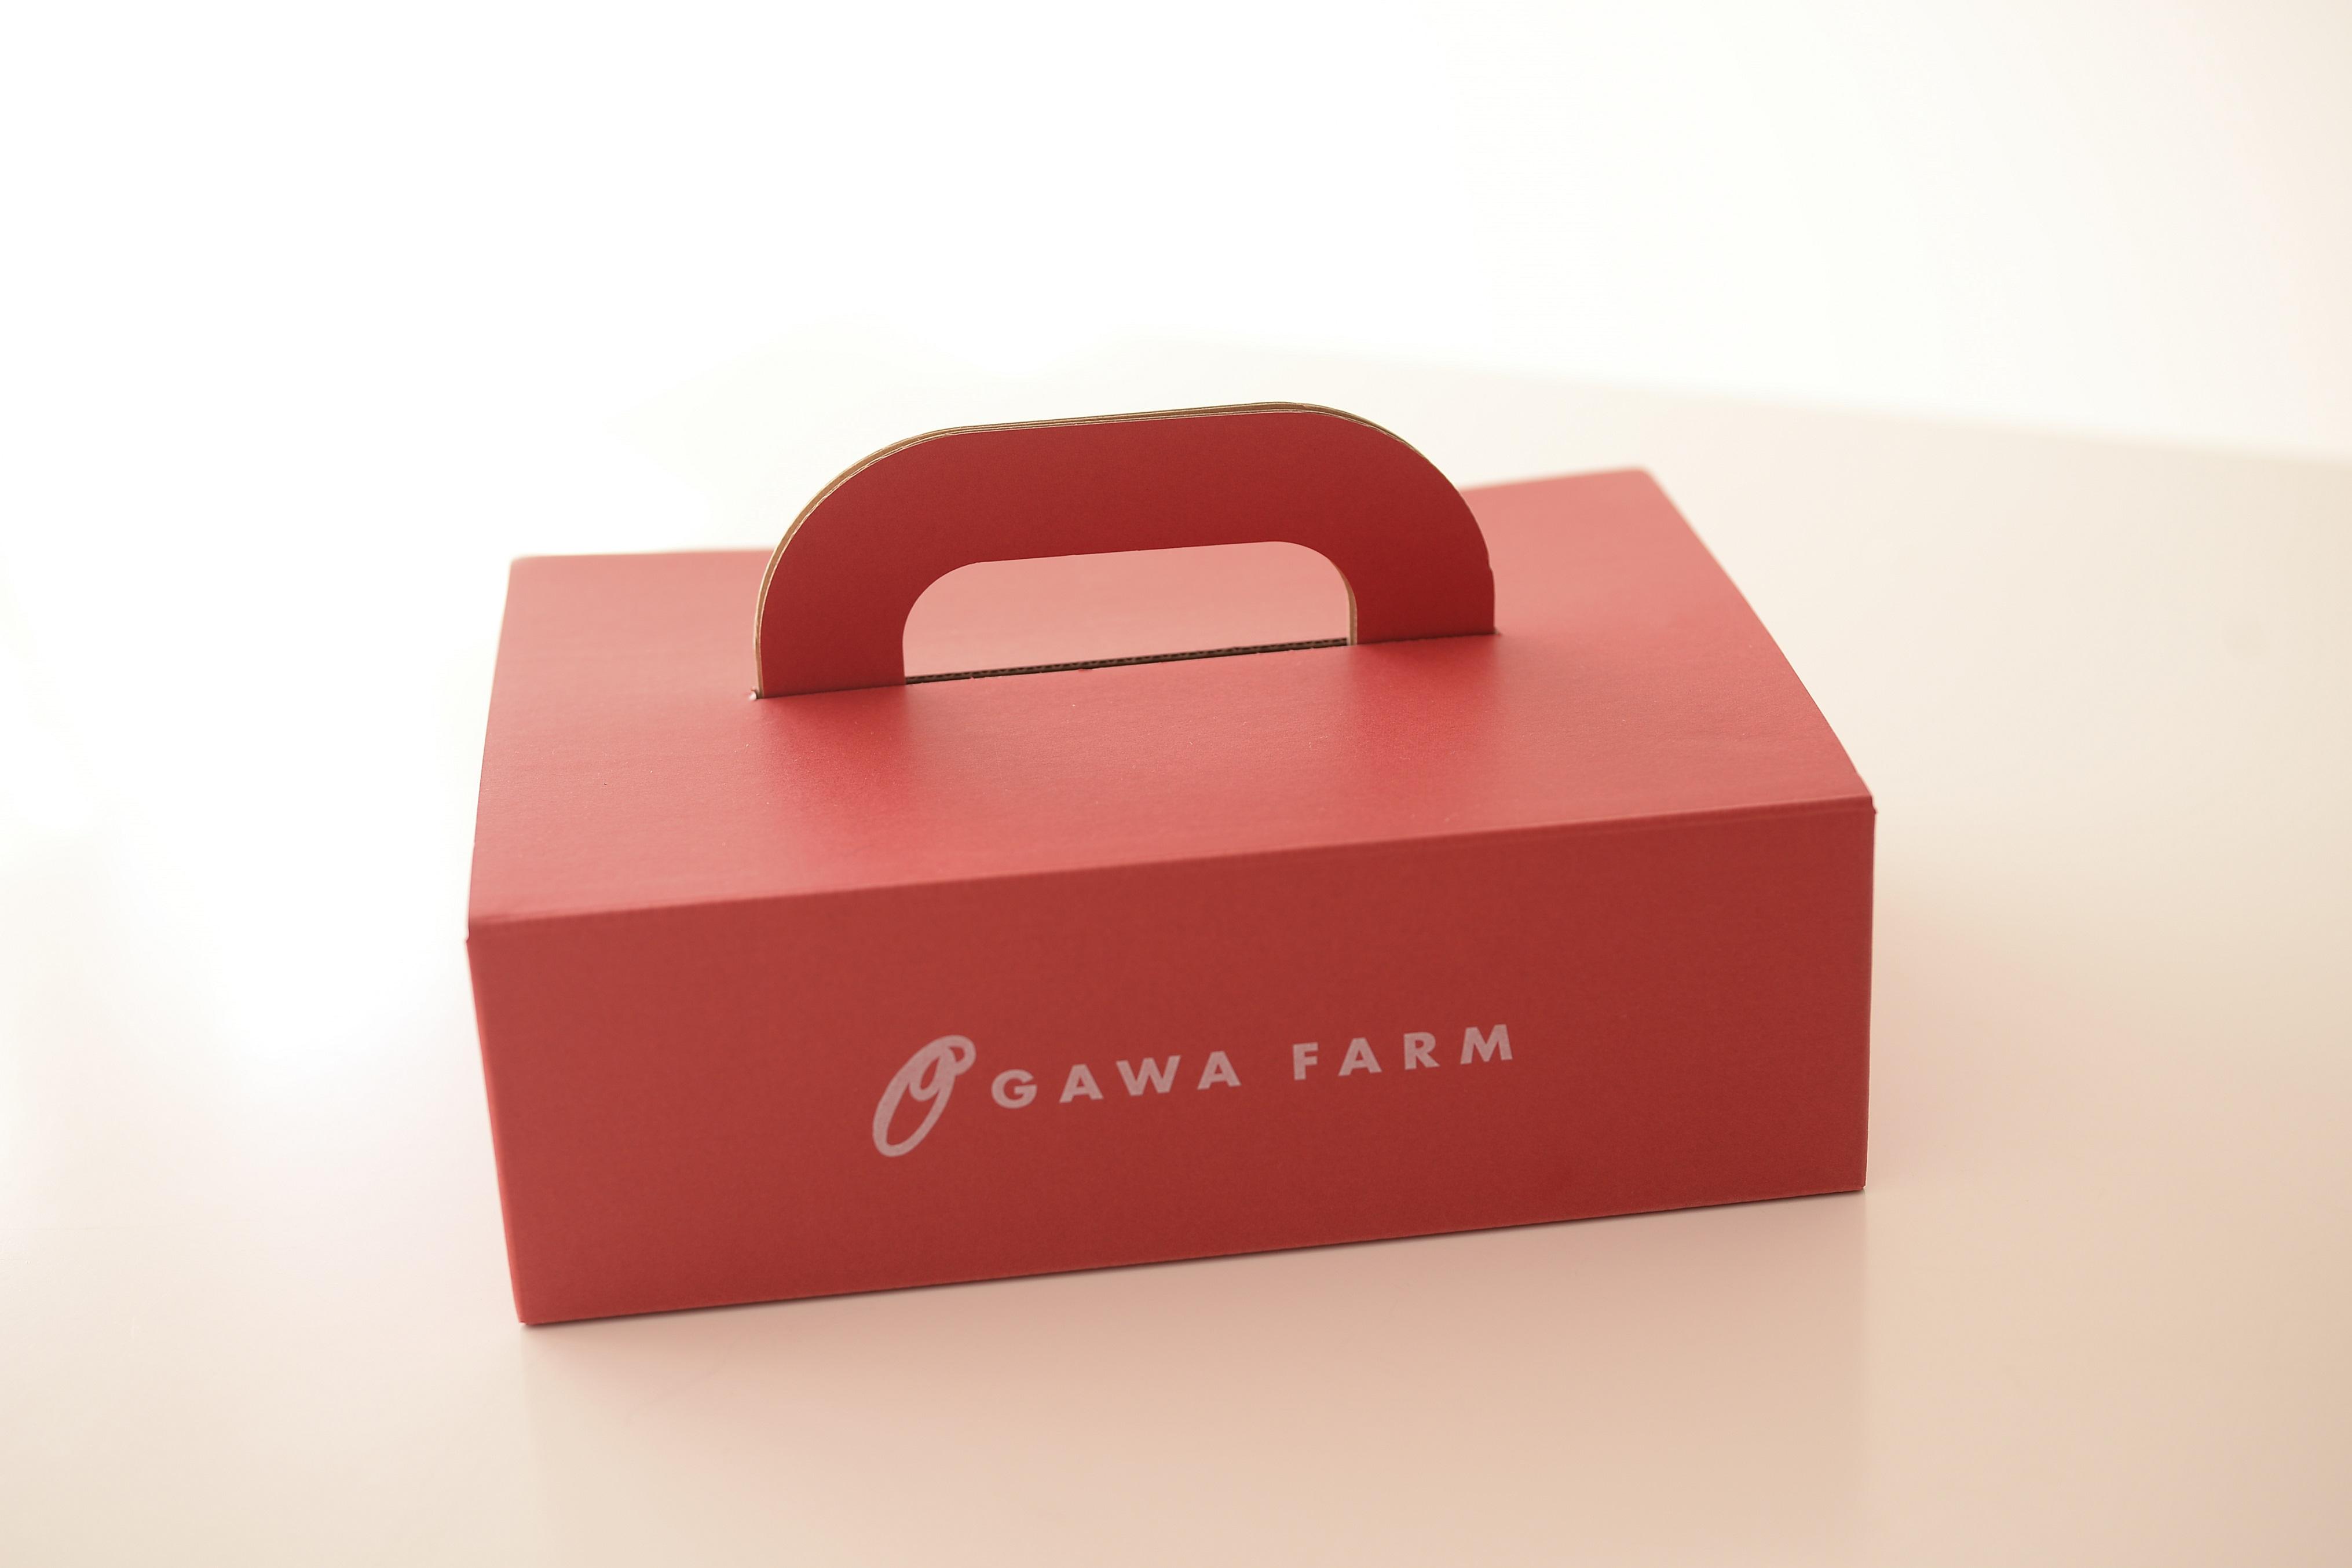 OGAWA FARM 香TOMATOギフトセット(1kg)